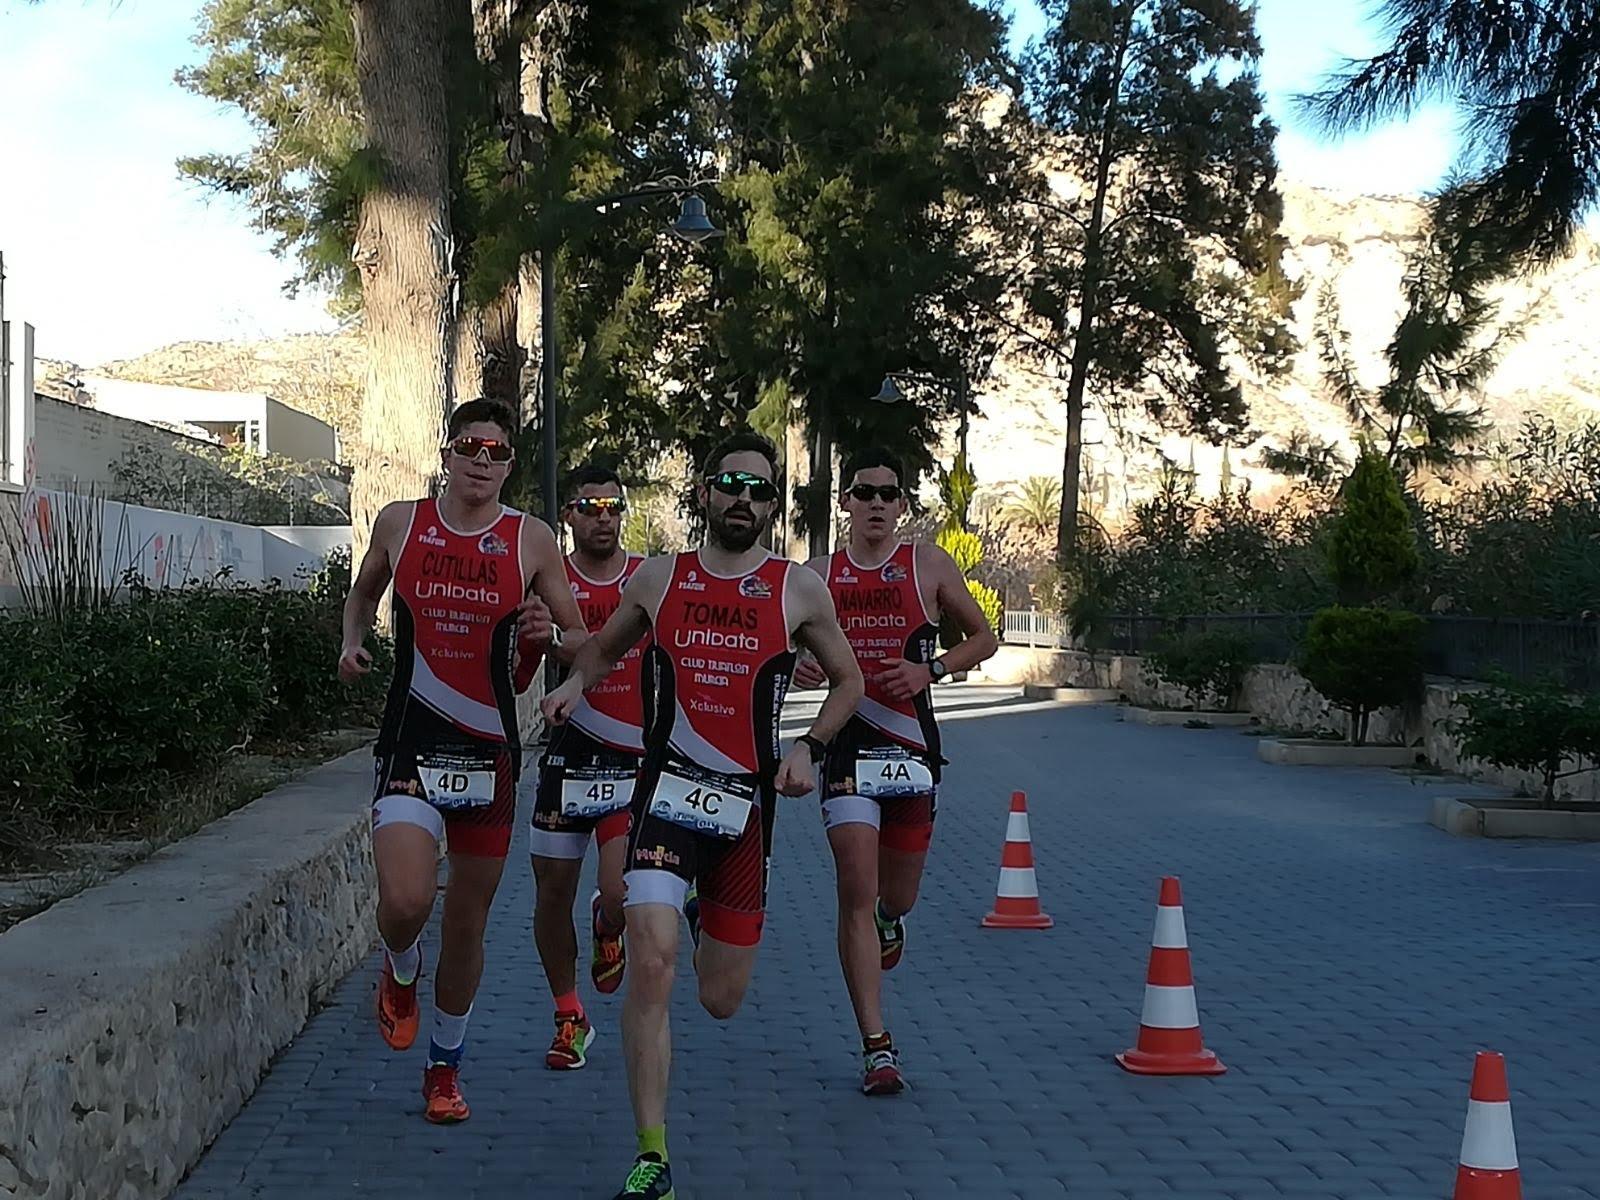 Club_Triatlon_Murcia_Unidata__Campeon_Regional_Duatln_por_Equipos_2018__Triatlon_Murcia_Archena_Femenino_2